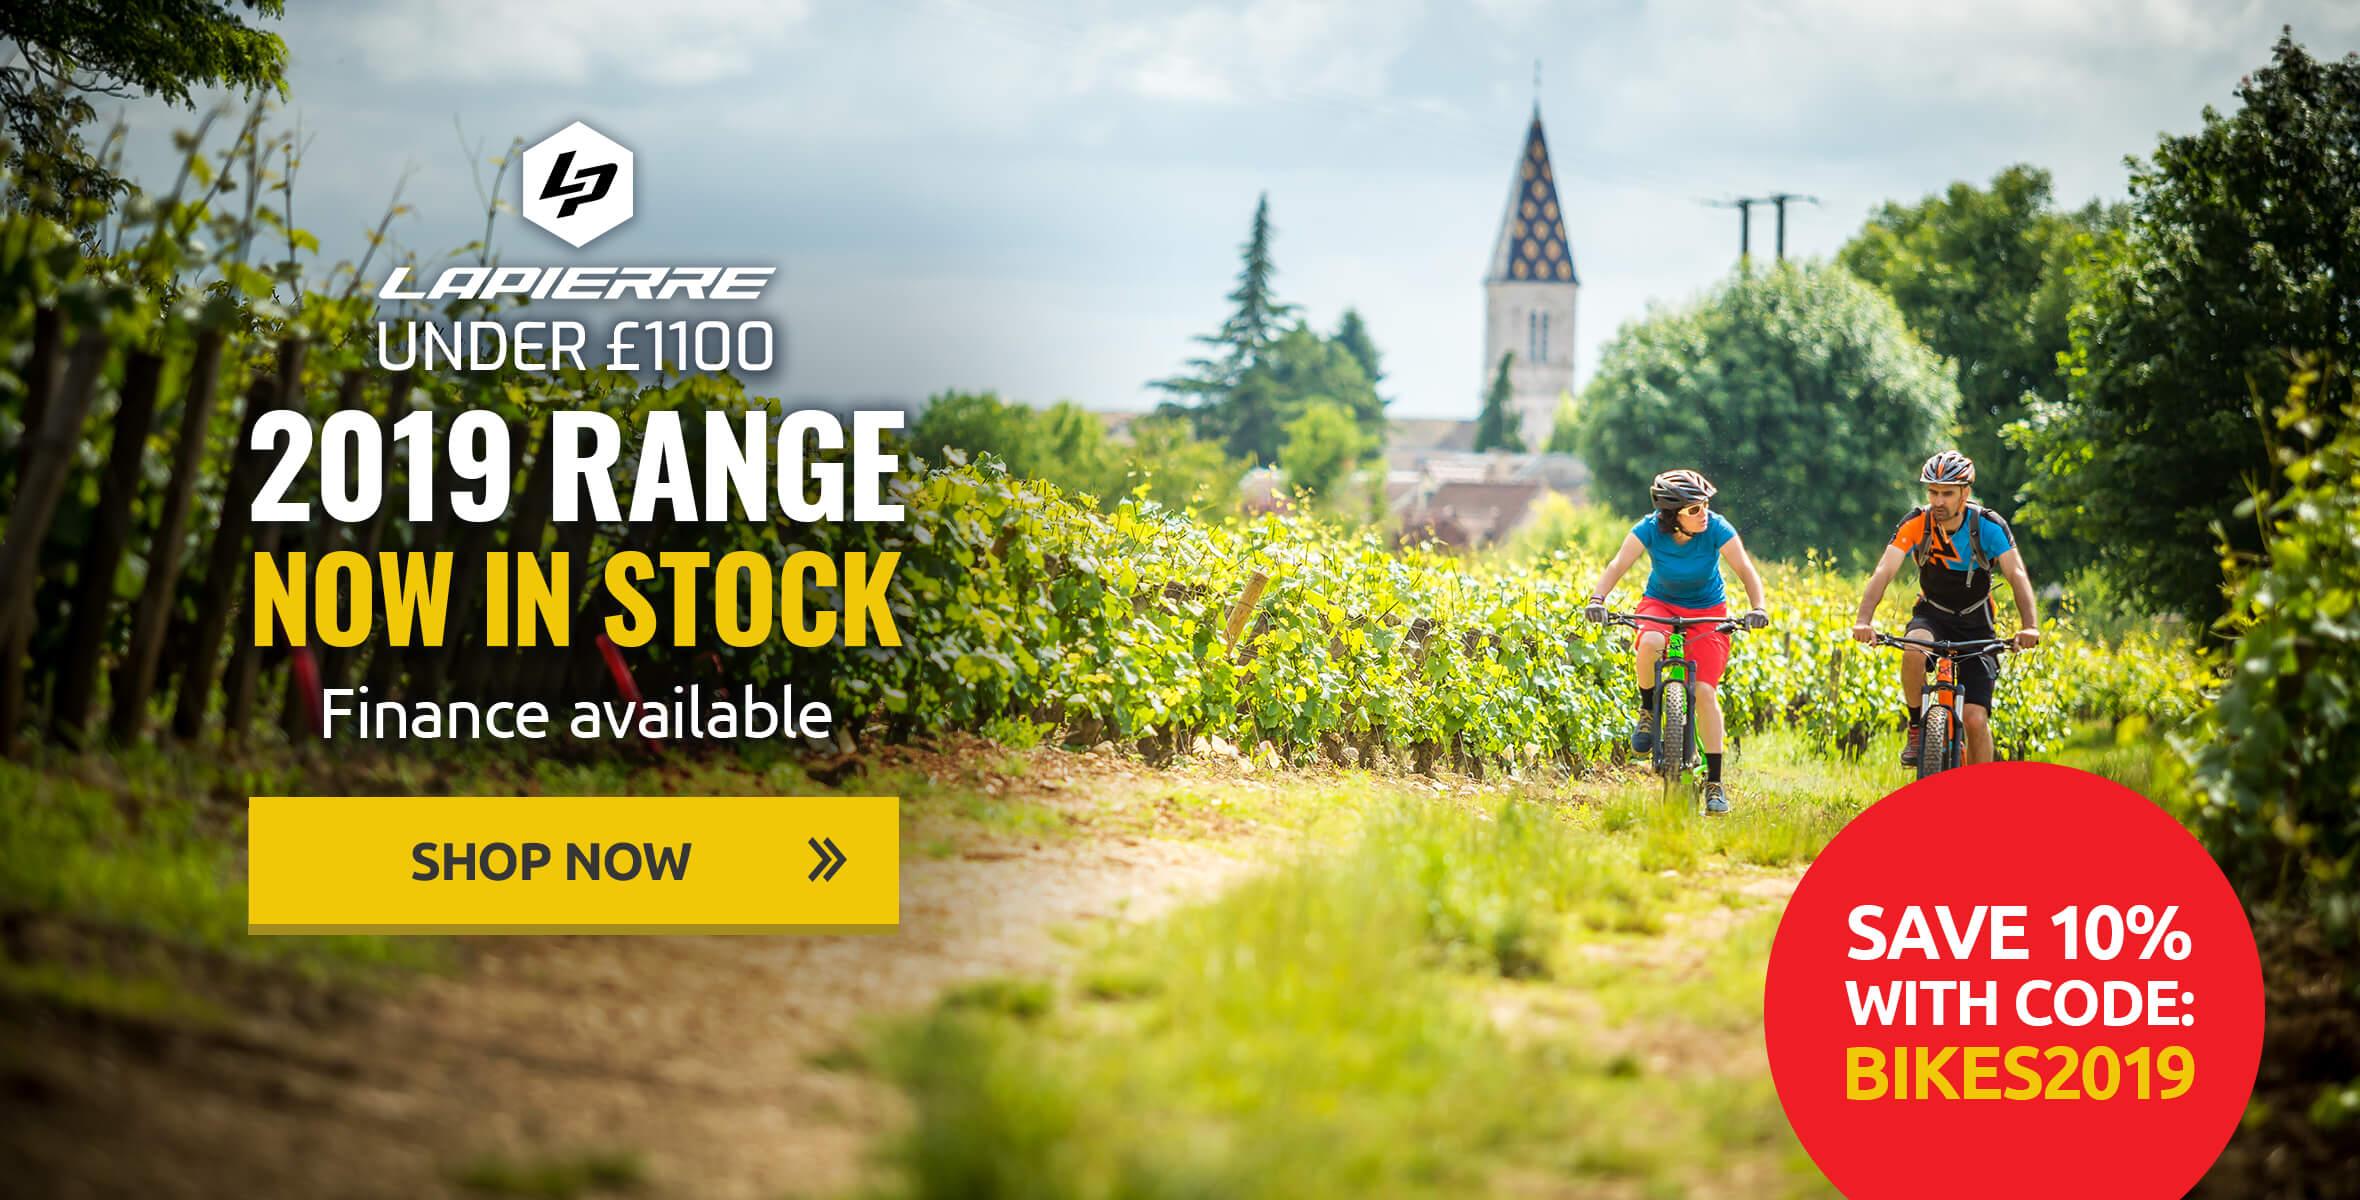 2019 Range Now in Stock